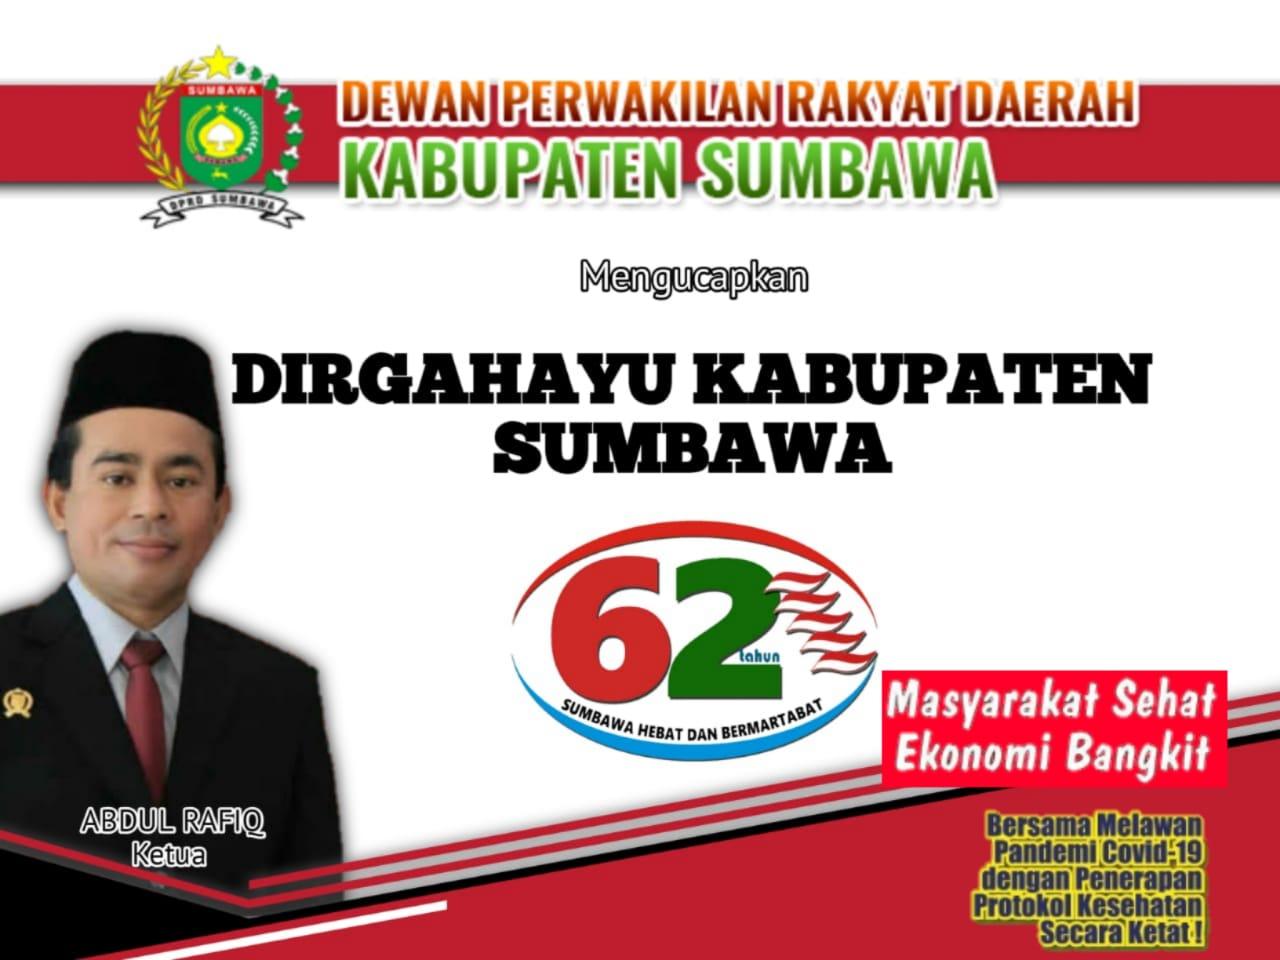 Ketua DPRD Kabupaten Sumbawa Mengucapkan Selamat Ulang Tahun ke-62 Kabupaten Sumbawa